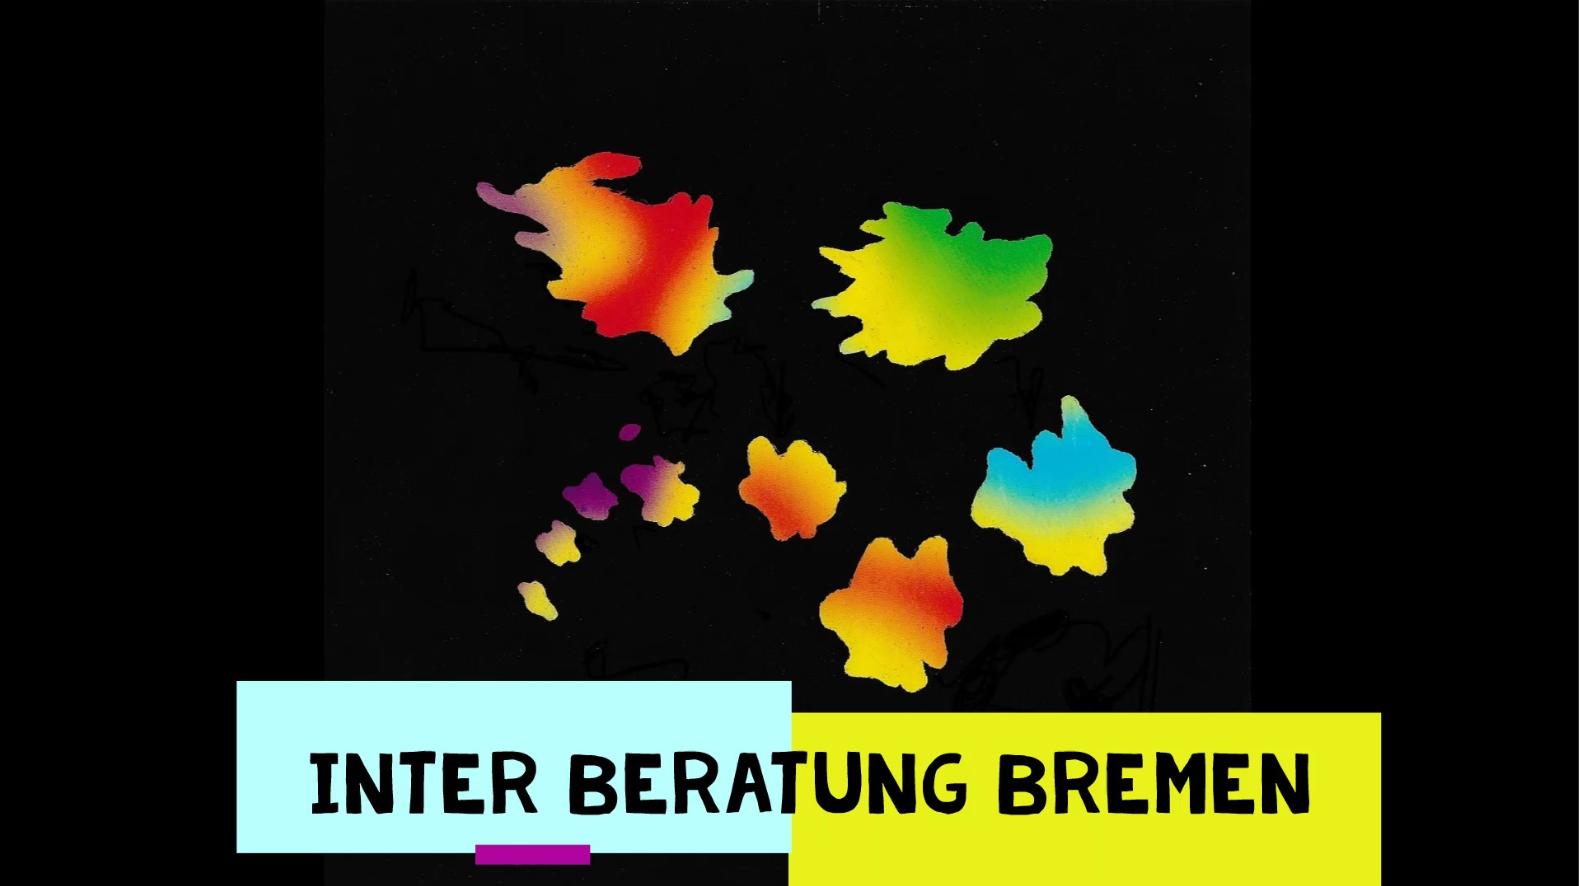 https://interberatung-bremen.de/wp-content/uploads/2020/11/IBB-Klecke-Foto-Muster.png